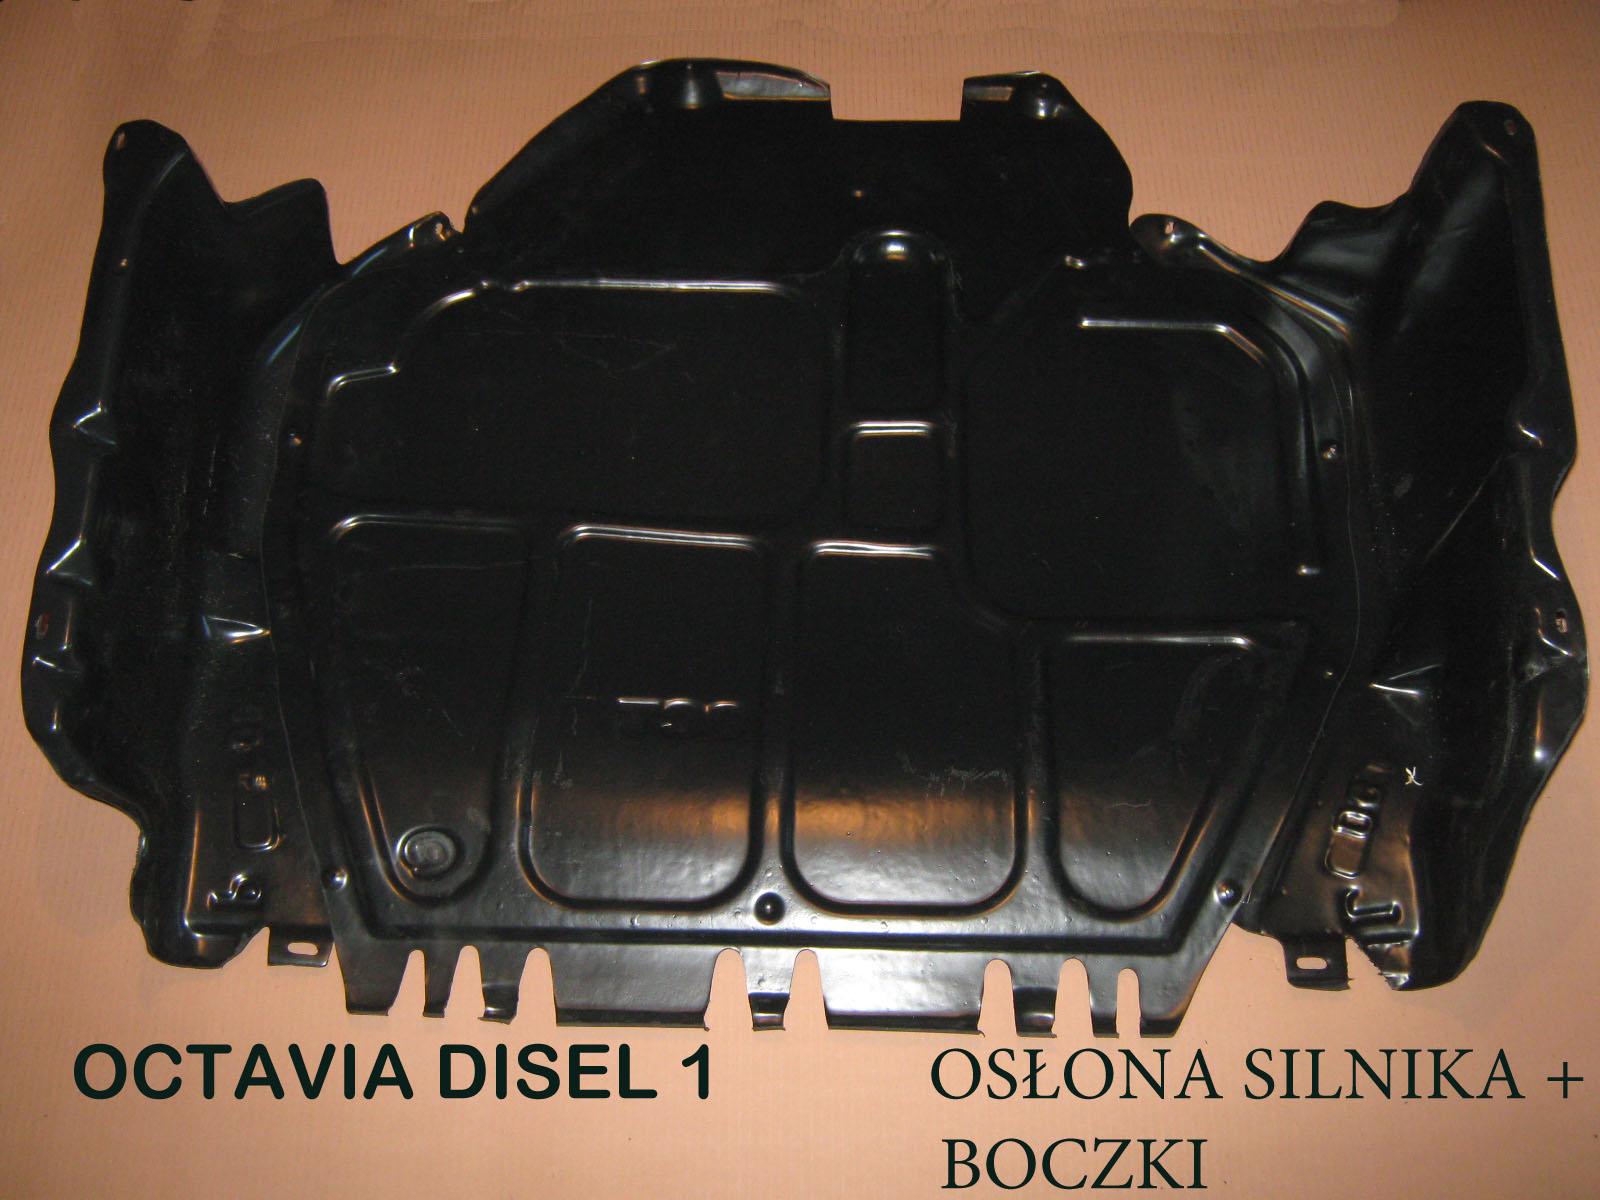 Gumové koberce VW Beetle 98R/Golf IV/Oct.I/Toledo/Leon99/Bora